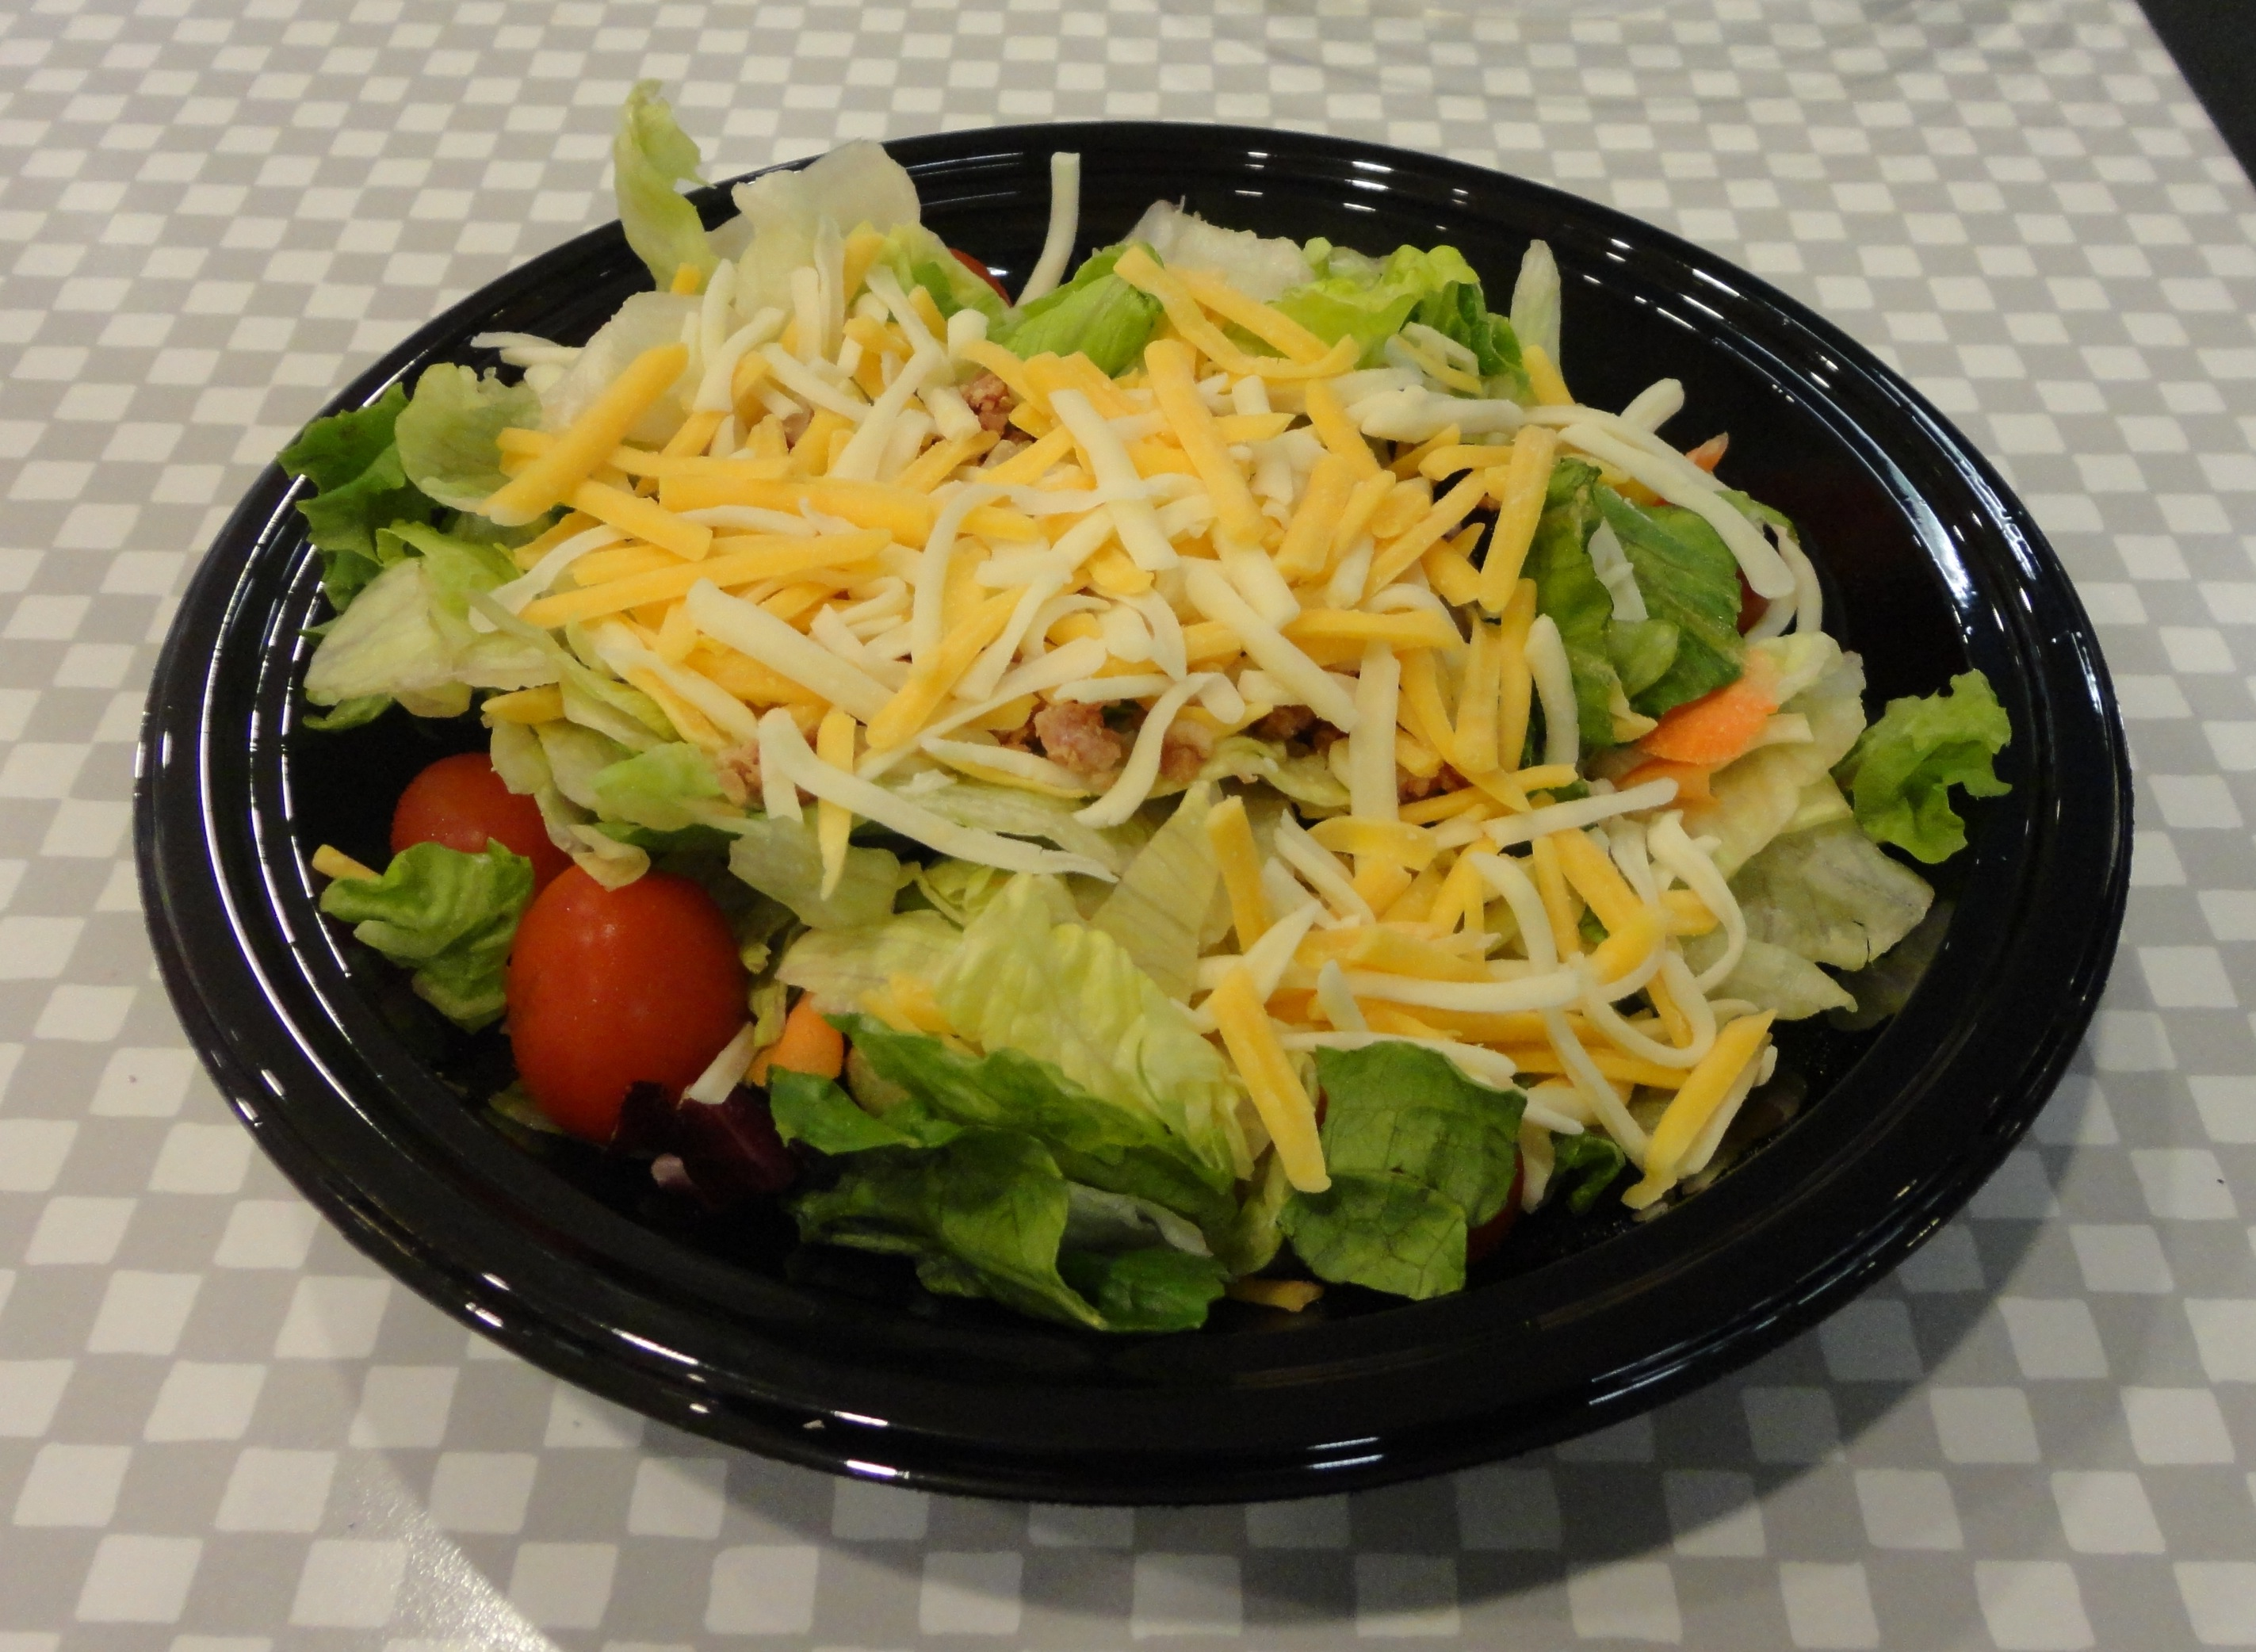 Mcdonald's Bacon Ranch Salad